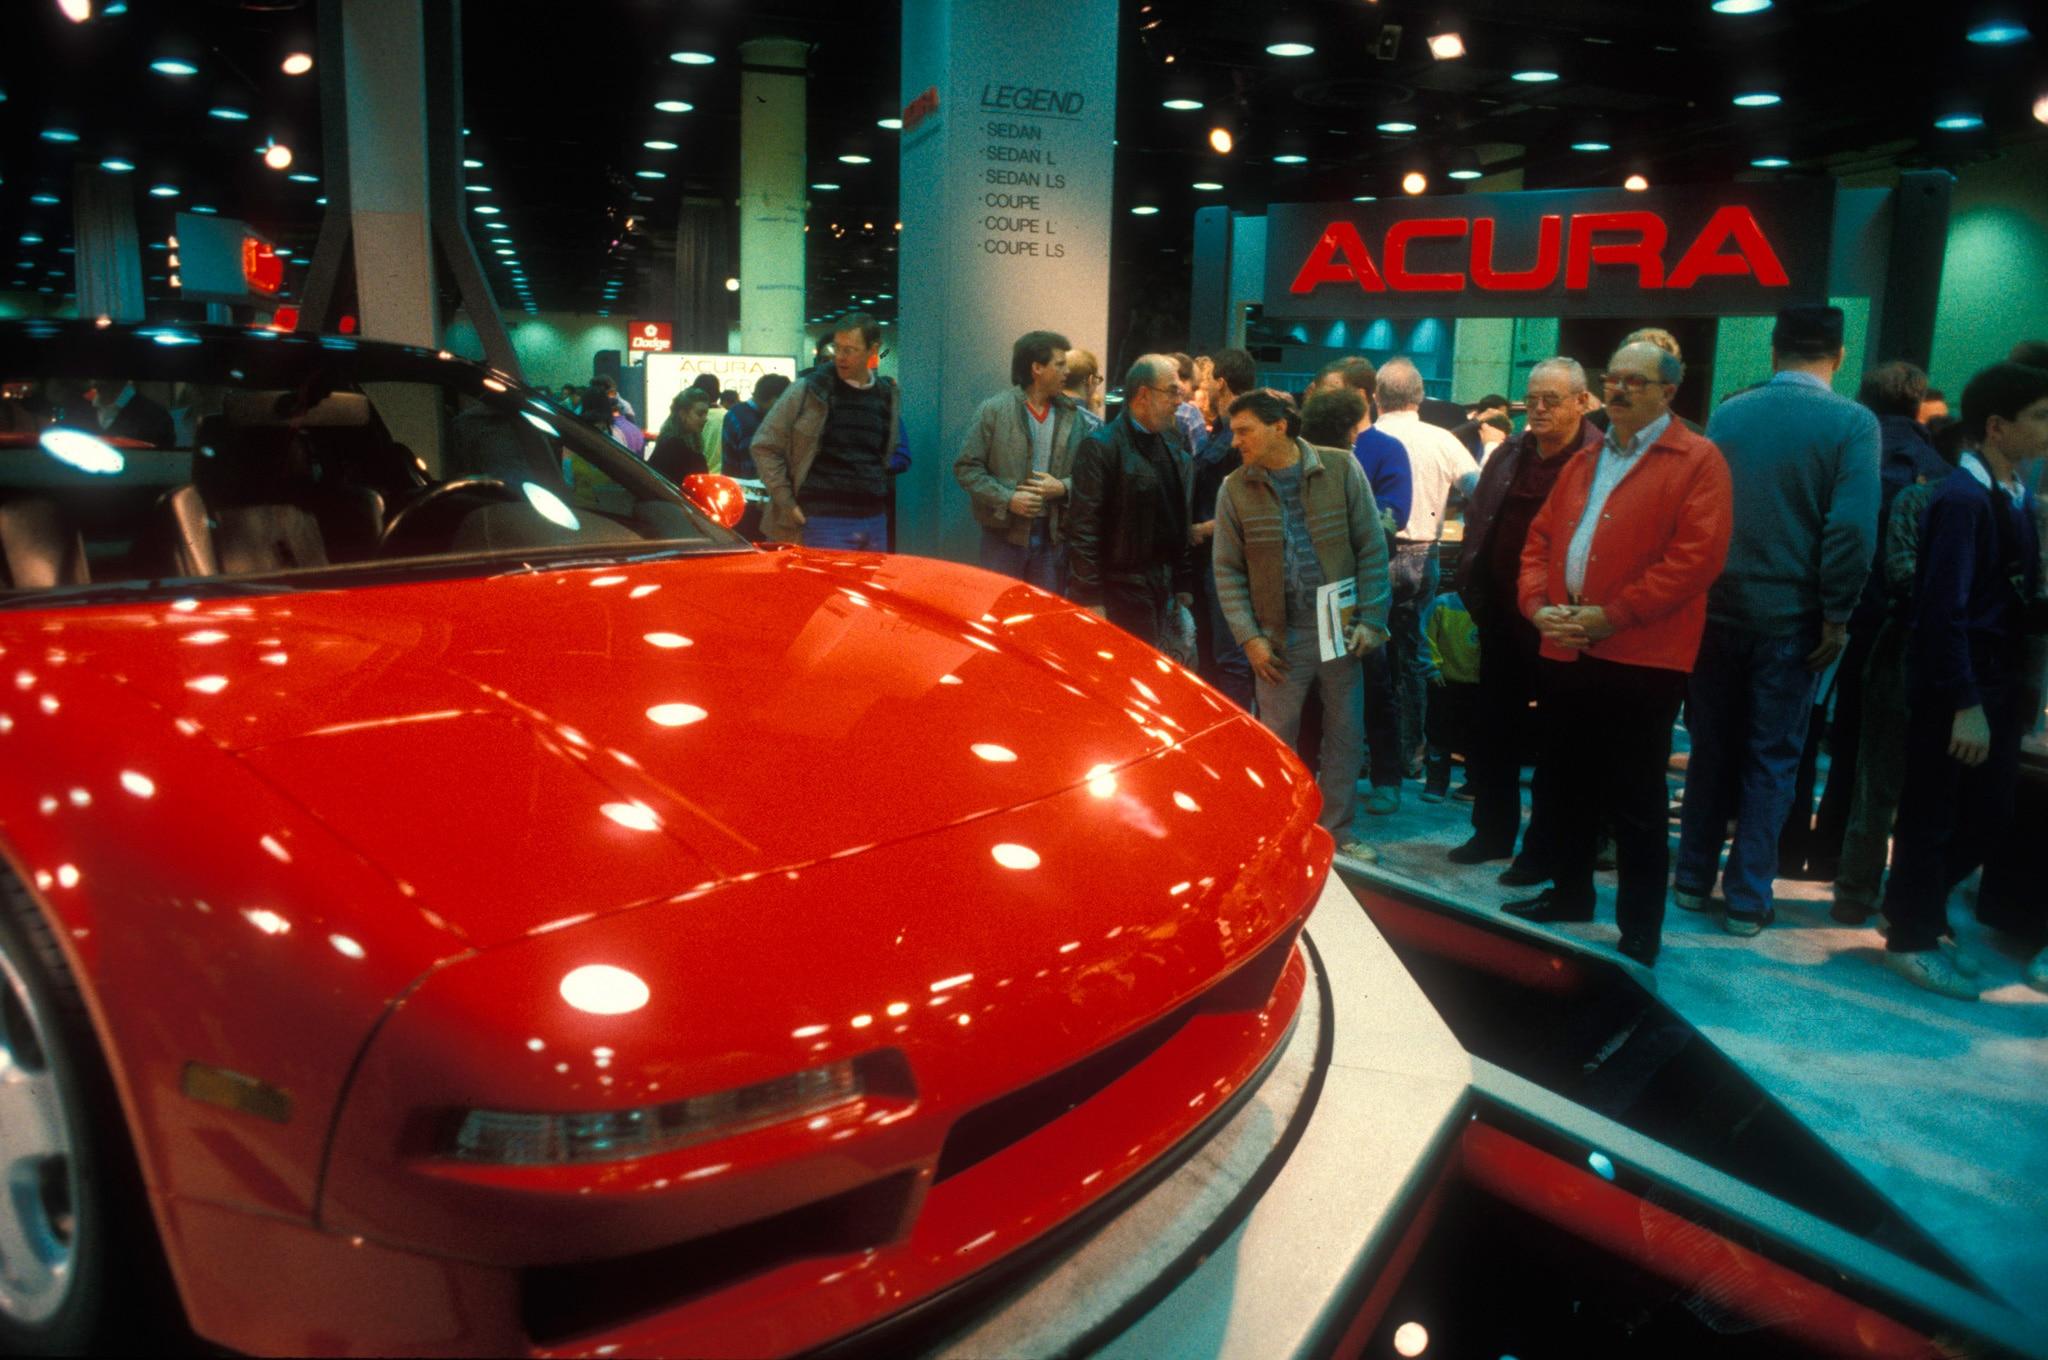 1989 Acura NSX Prototype During Chicago Auto Show Public Days1